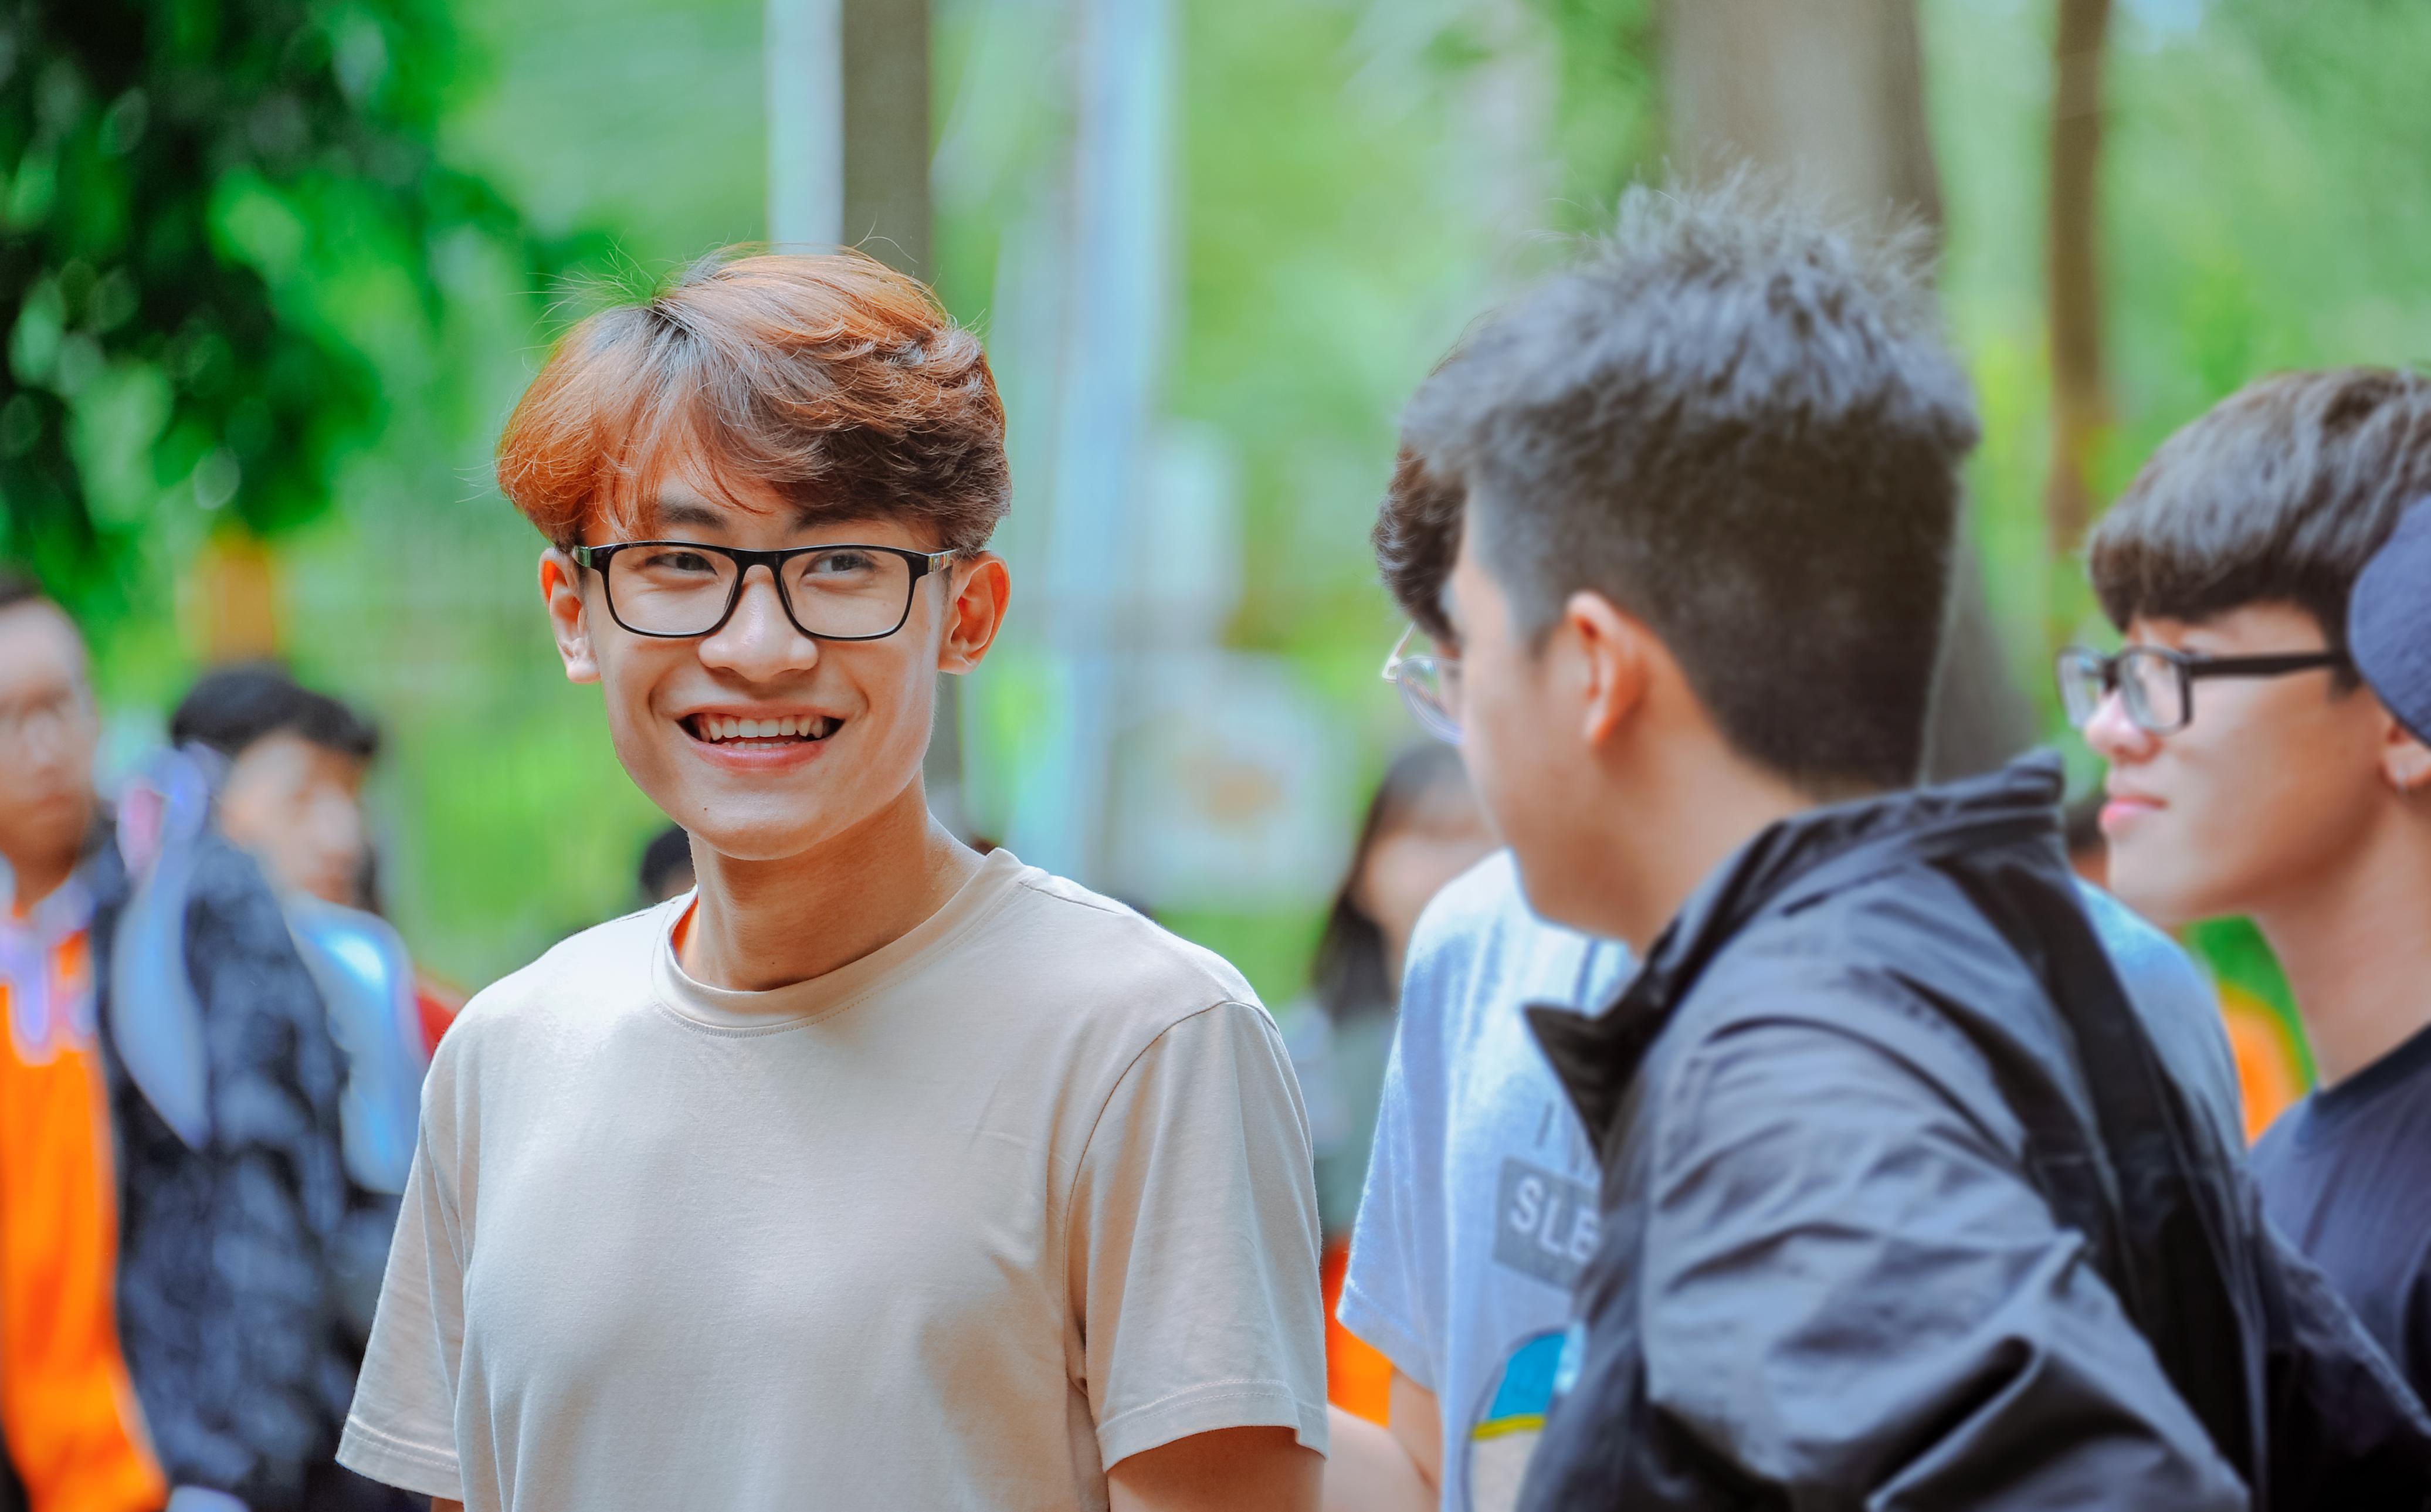 371b65078ad8 beautiful boy glasses vision care youth community fun smile sunglasses  student plant tree recreation girl eyewear